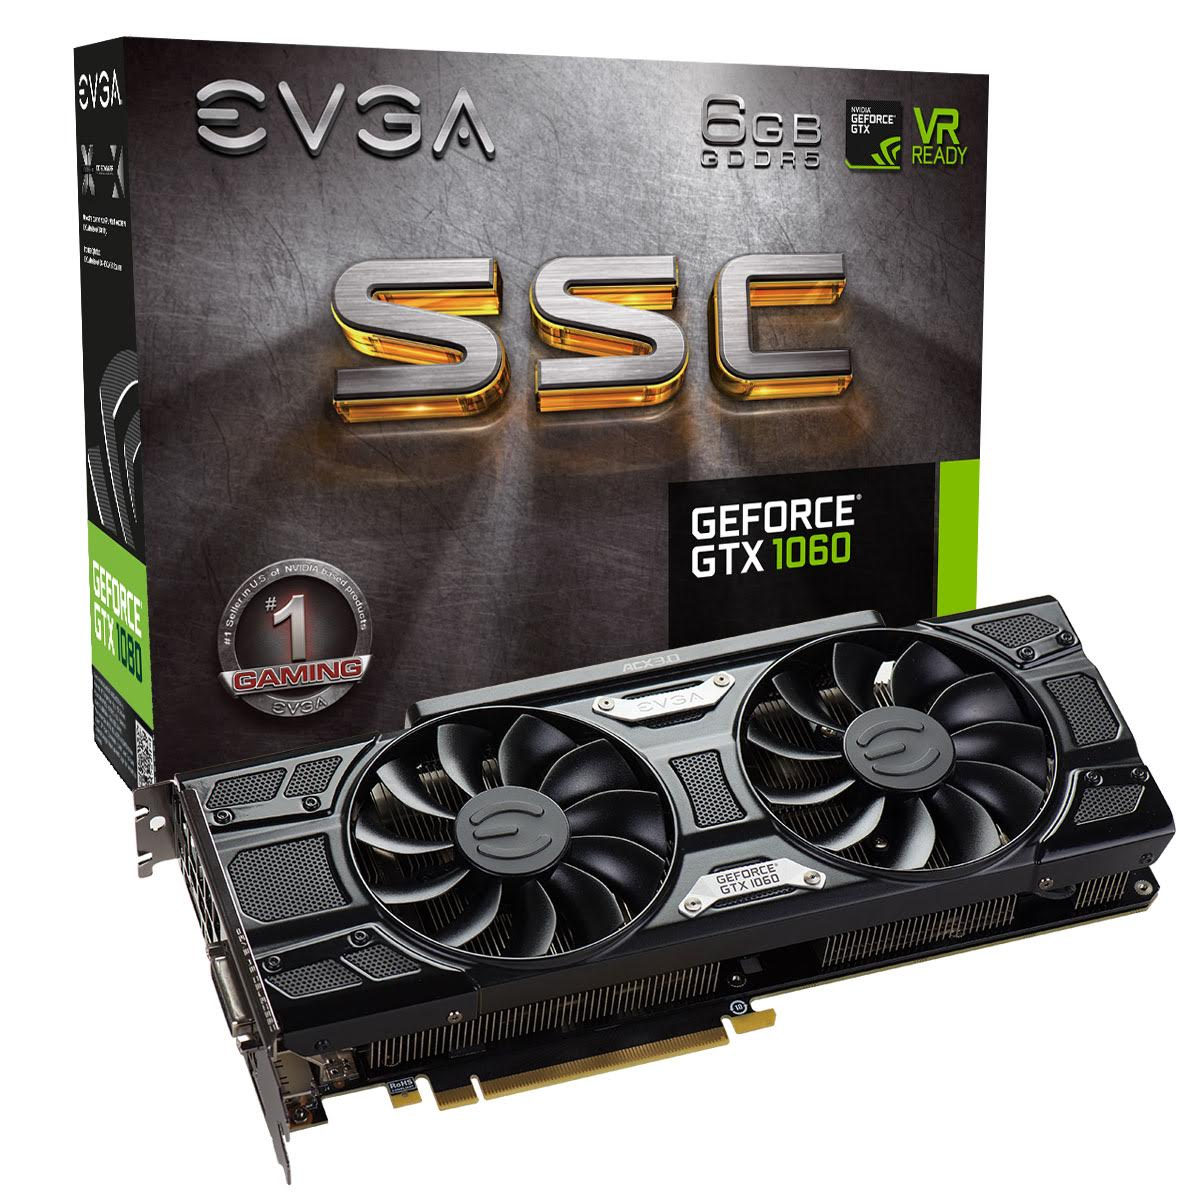 EVGA GeForce GTX 1060 Lineup - LanOC Reviews